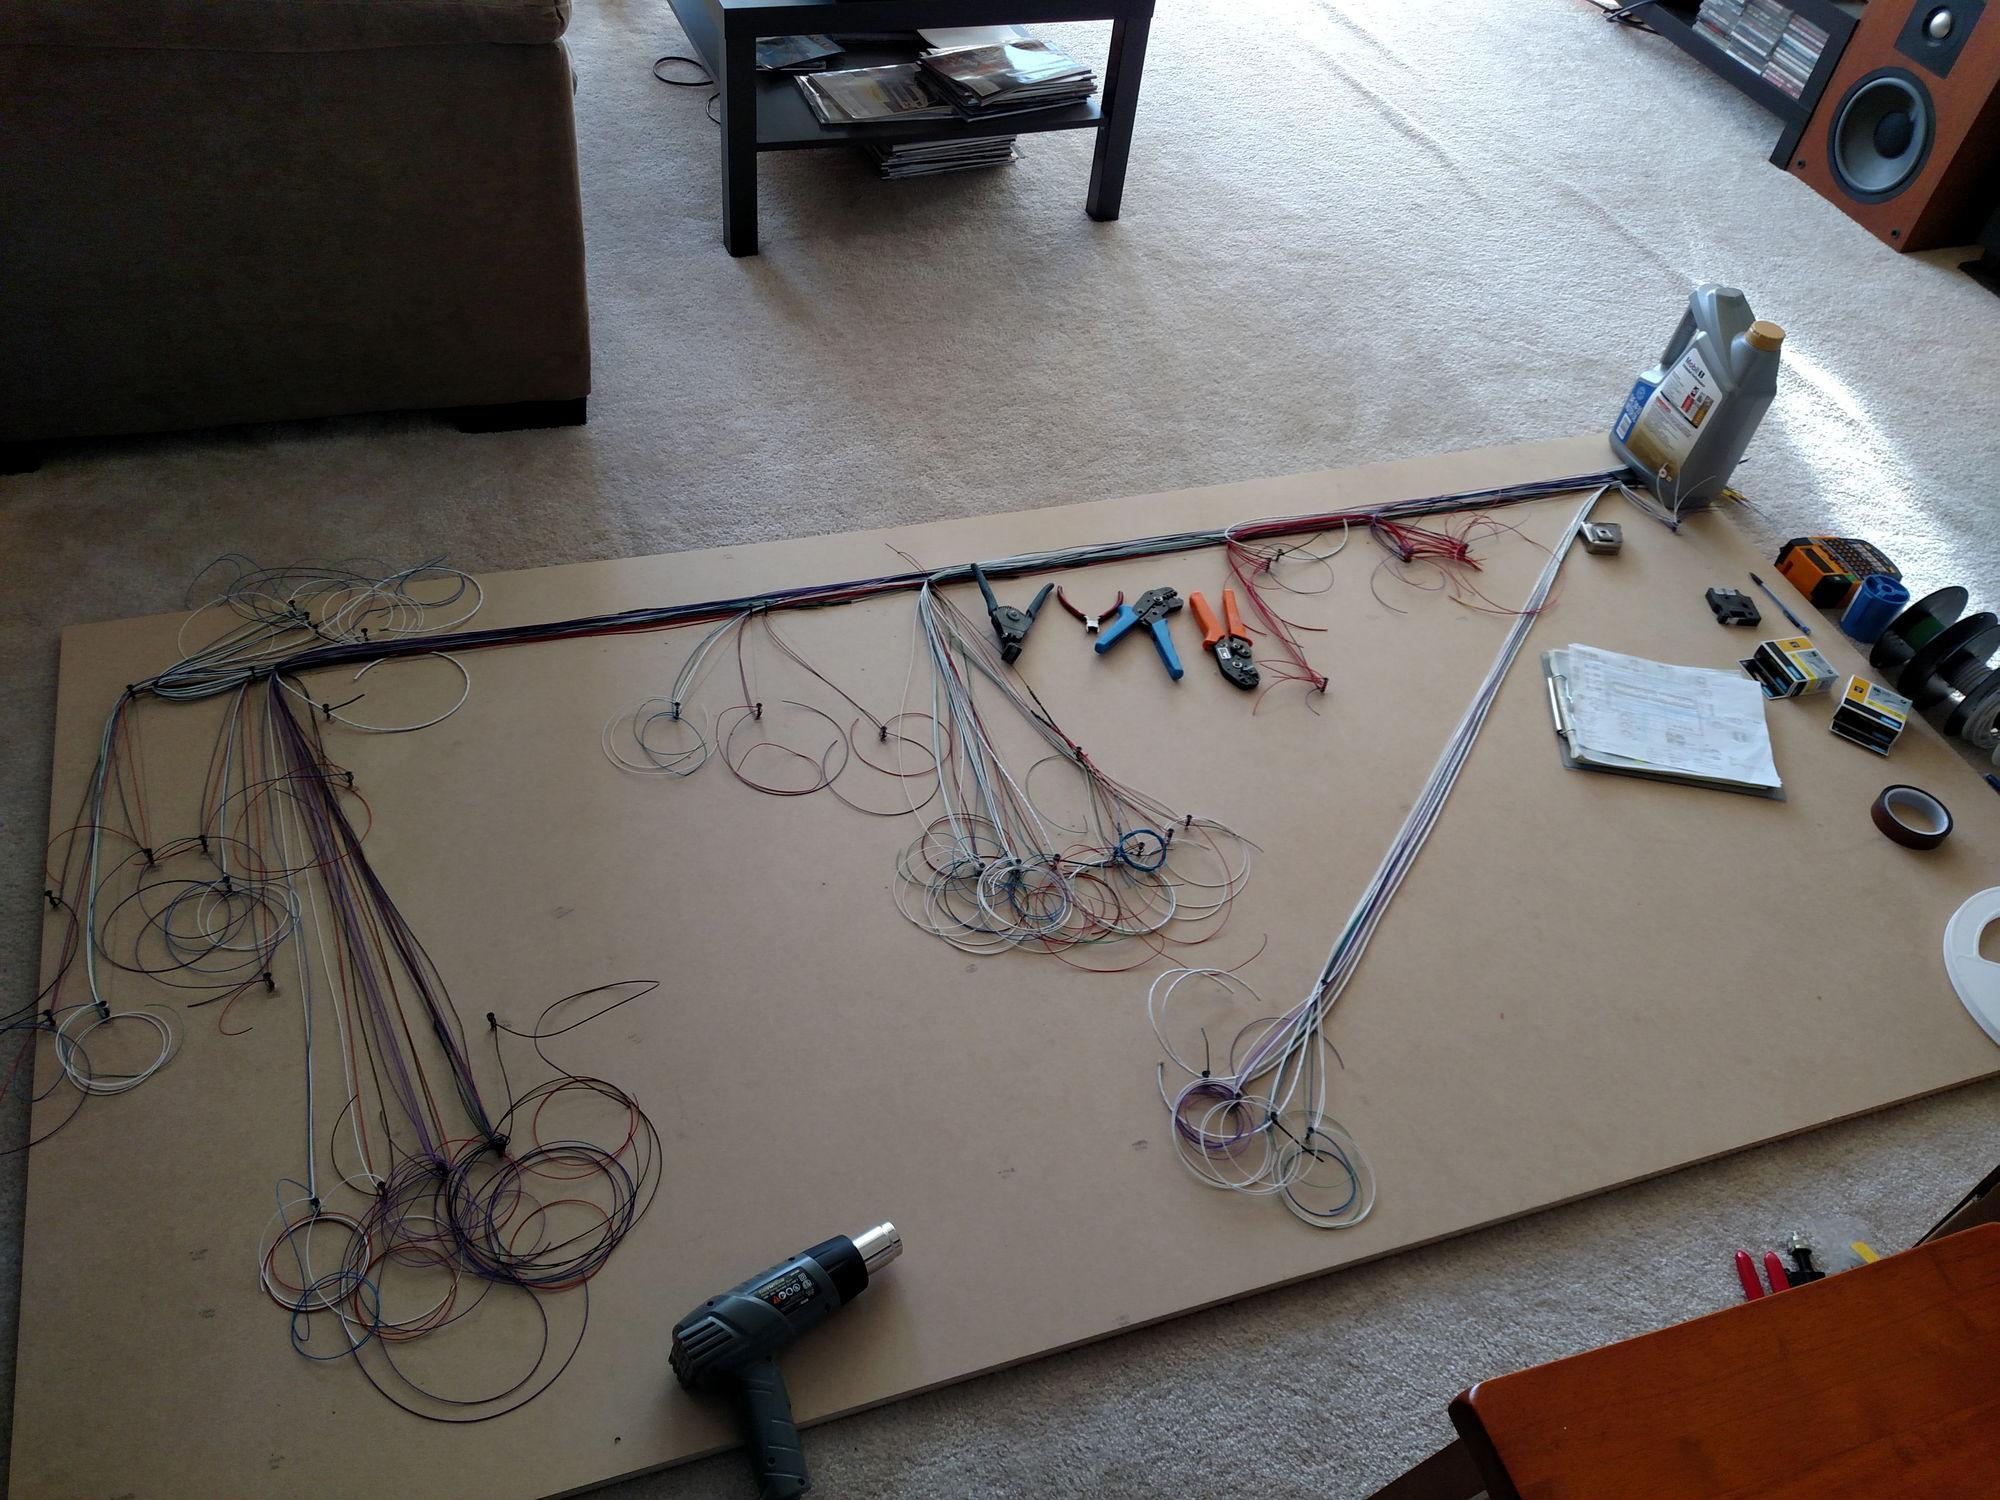 80 img_20151114_153316491_08928bcf9f6cdea31b4ae9326563f4da2d7b7b71 motec m1 wiring diagram dual caliber trigger adjustment diagram  at gsmx.co